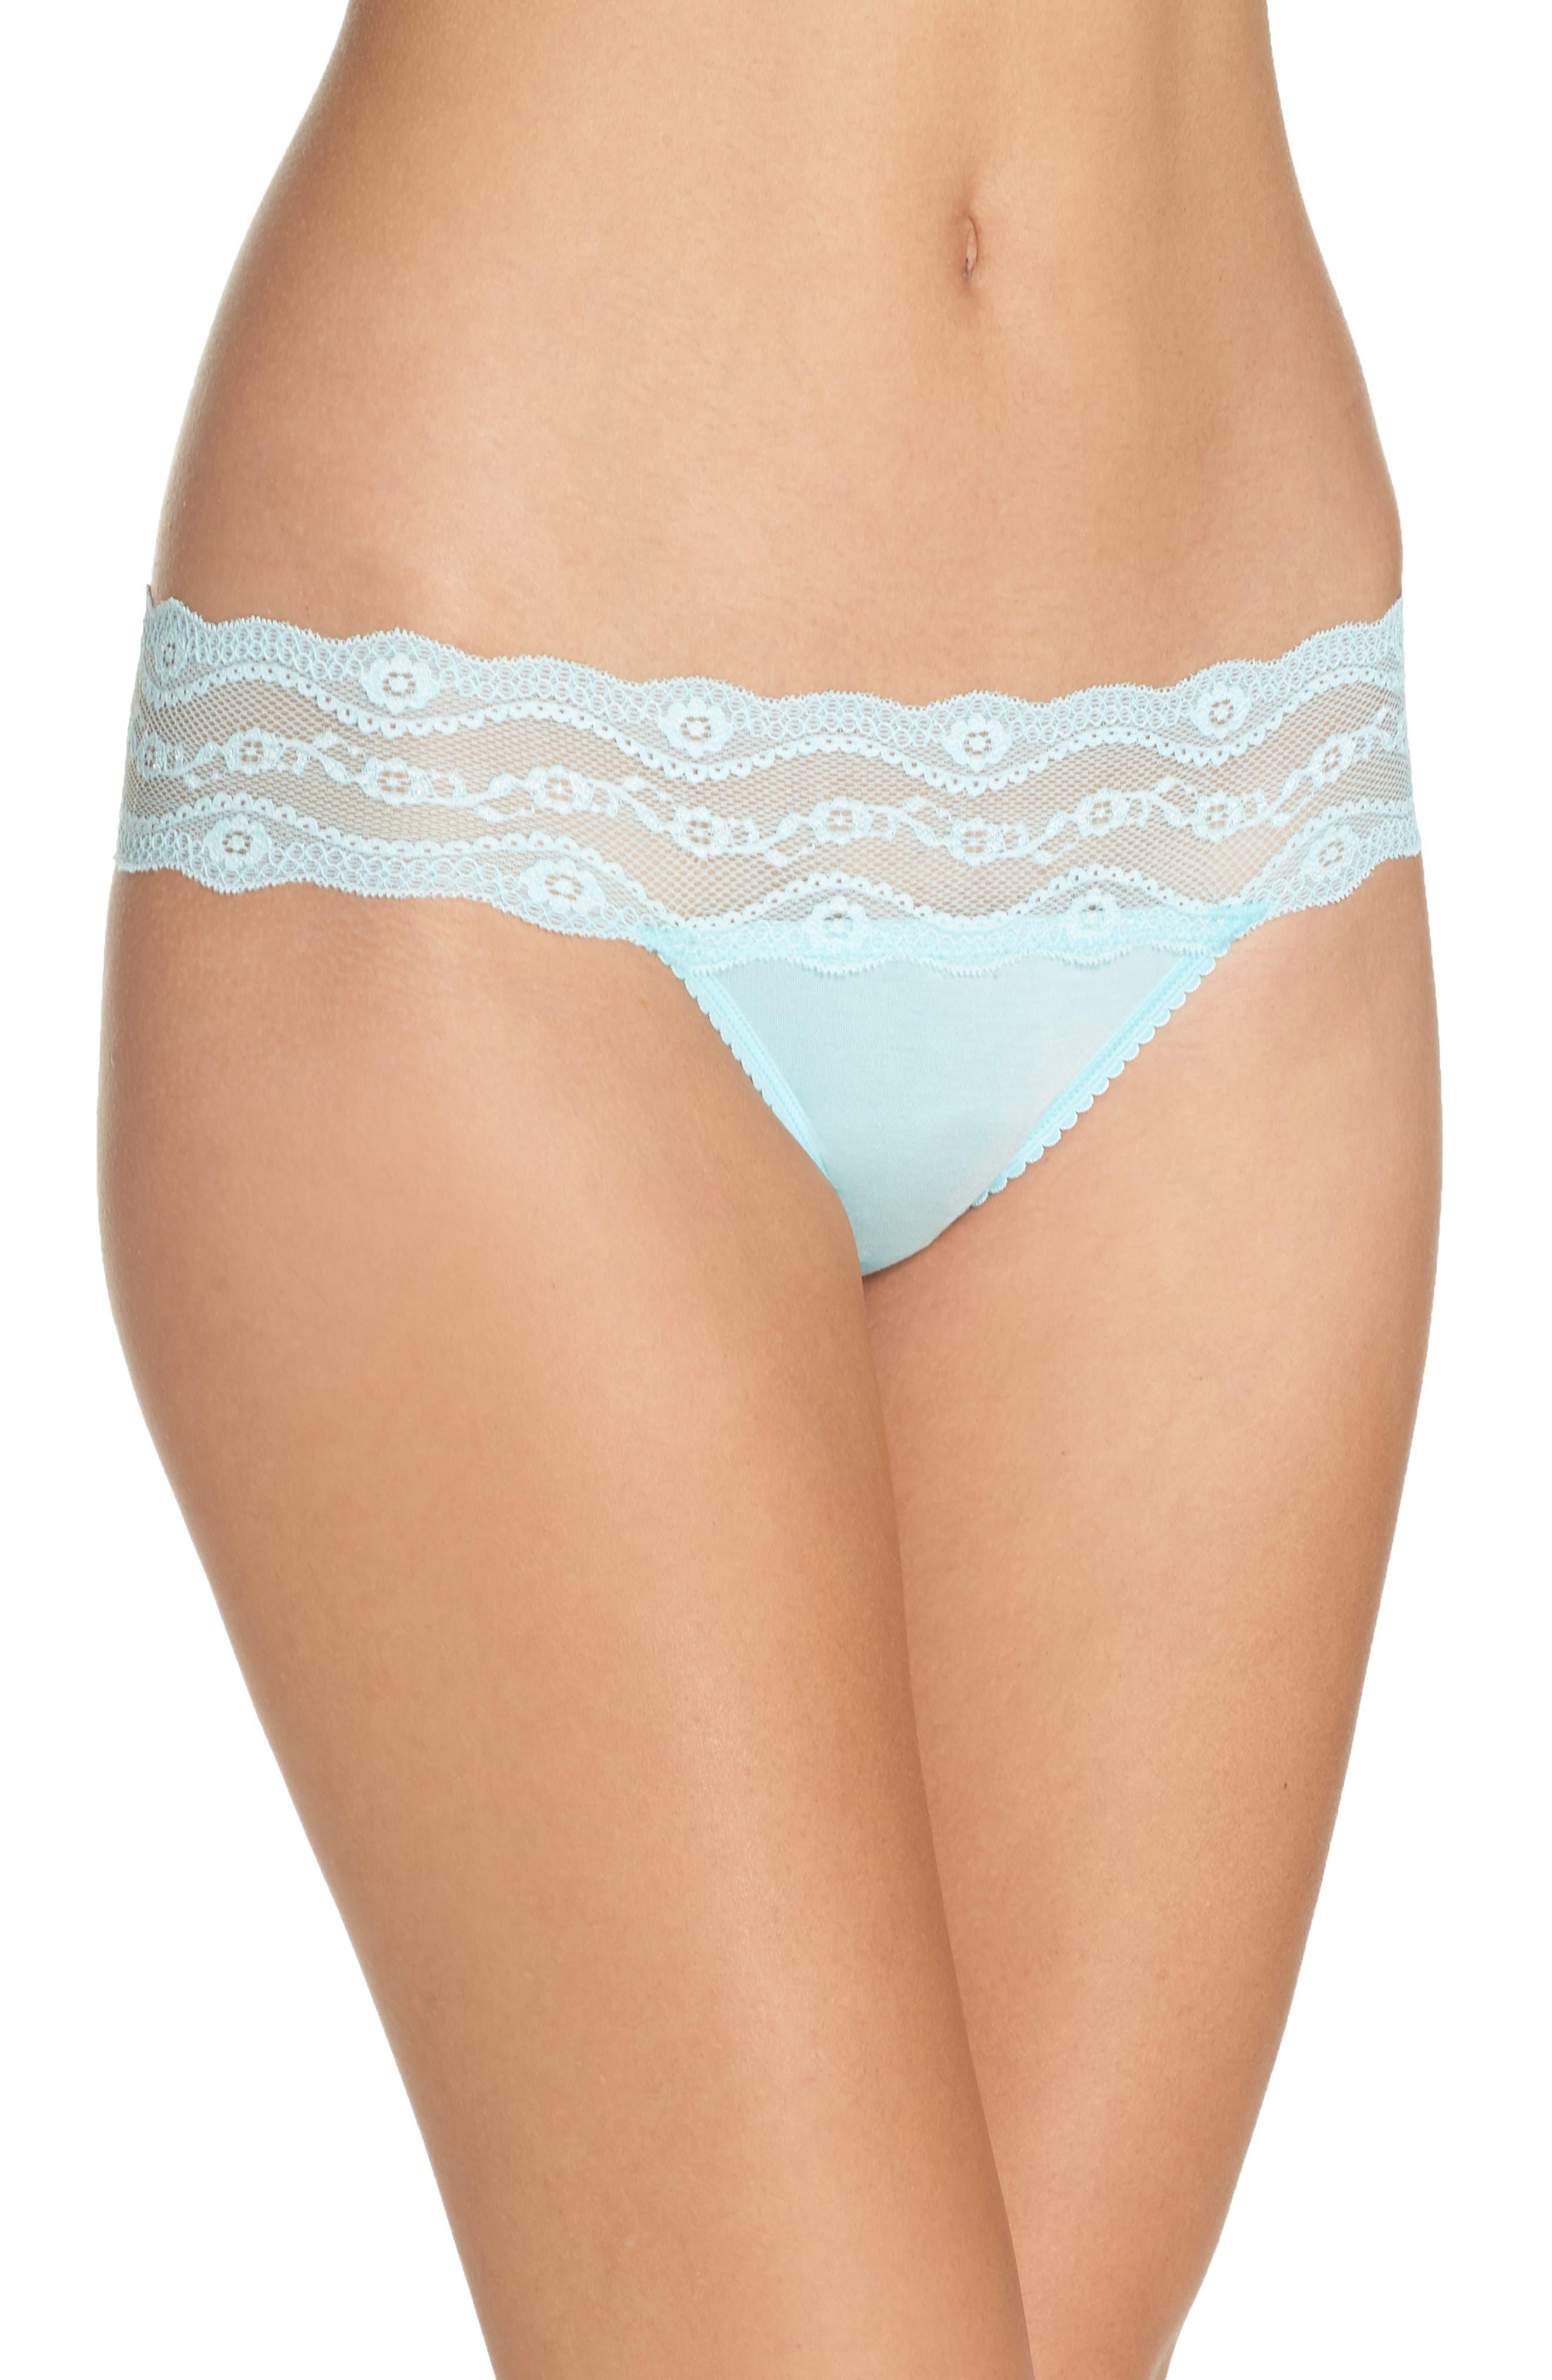 Alternate Image 1 Selected - b.tempt'd by Wacoal B. Adorable Bikini (3 for $33)